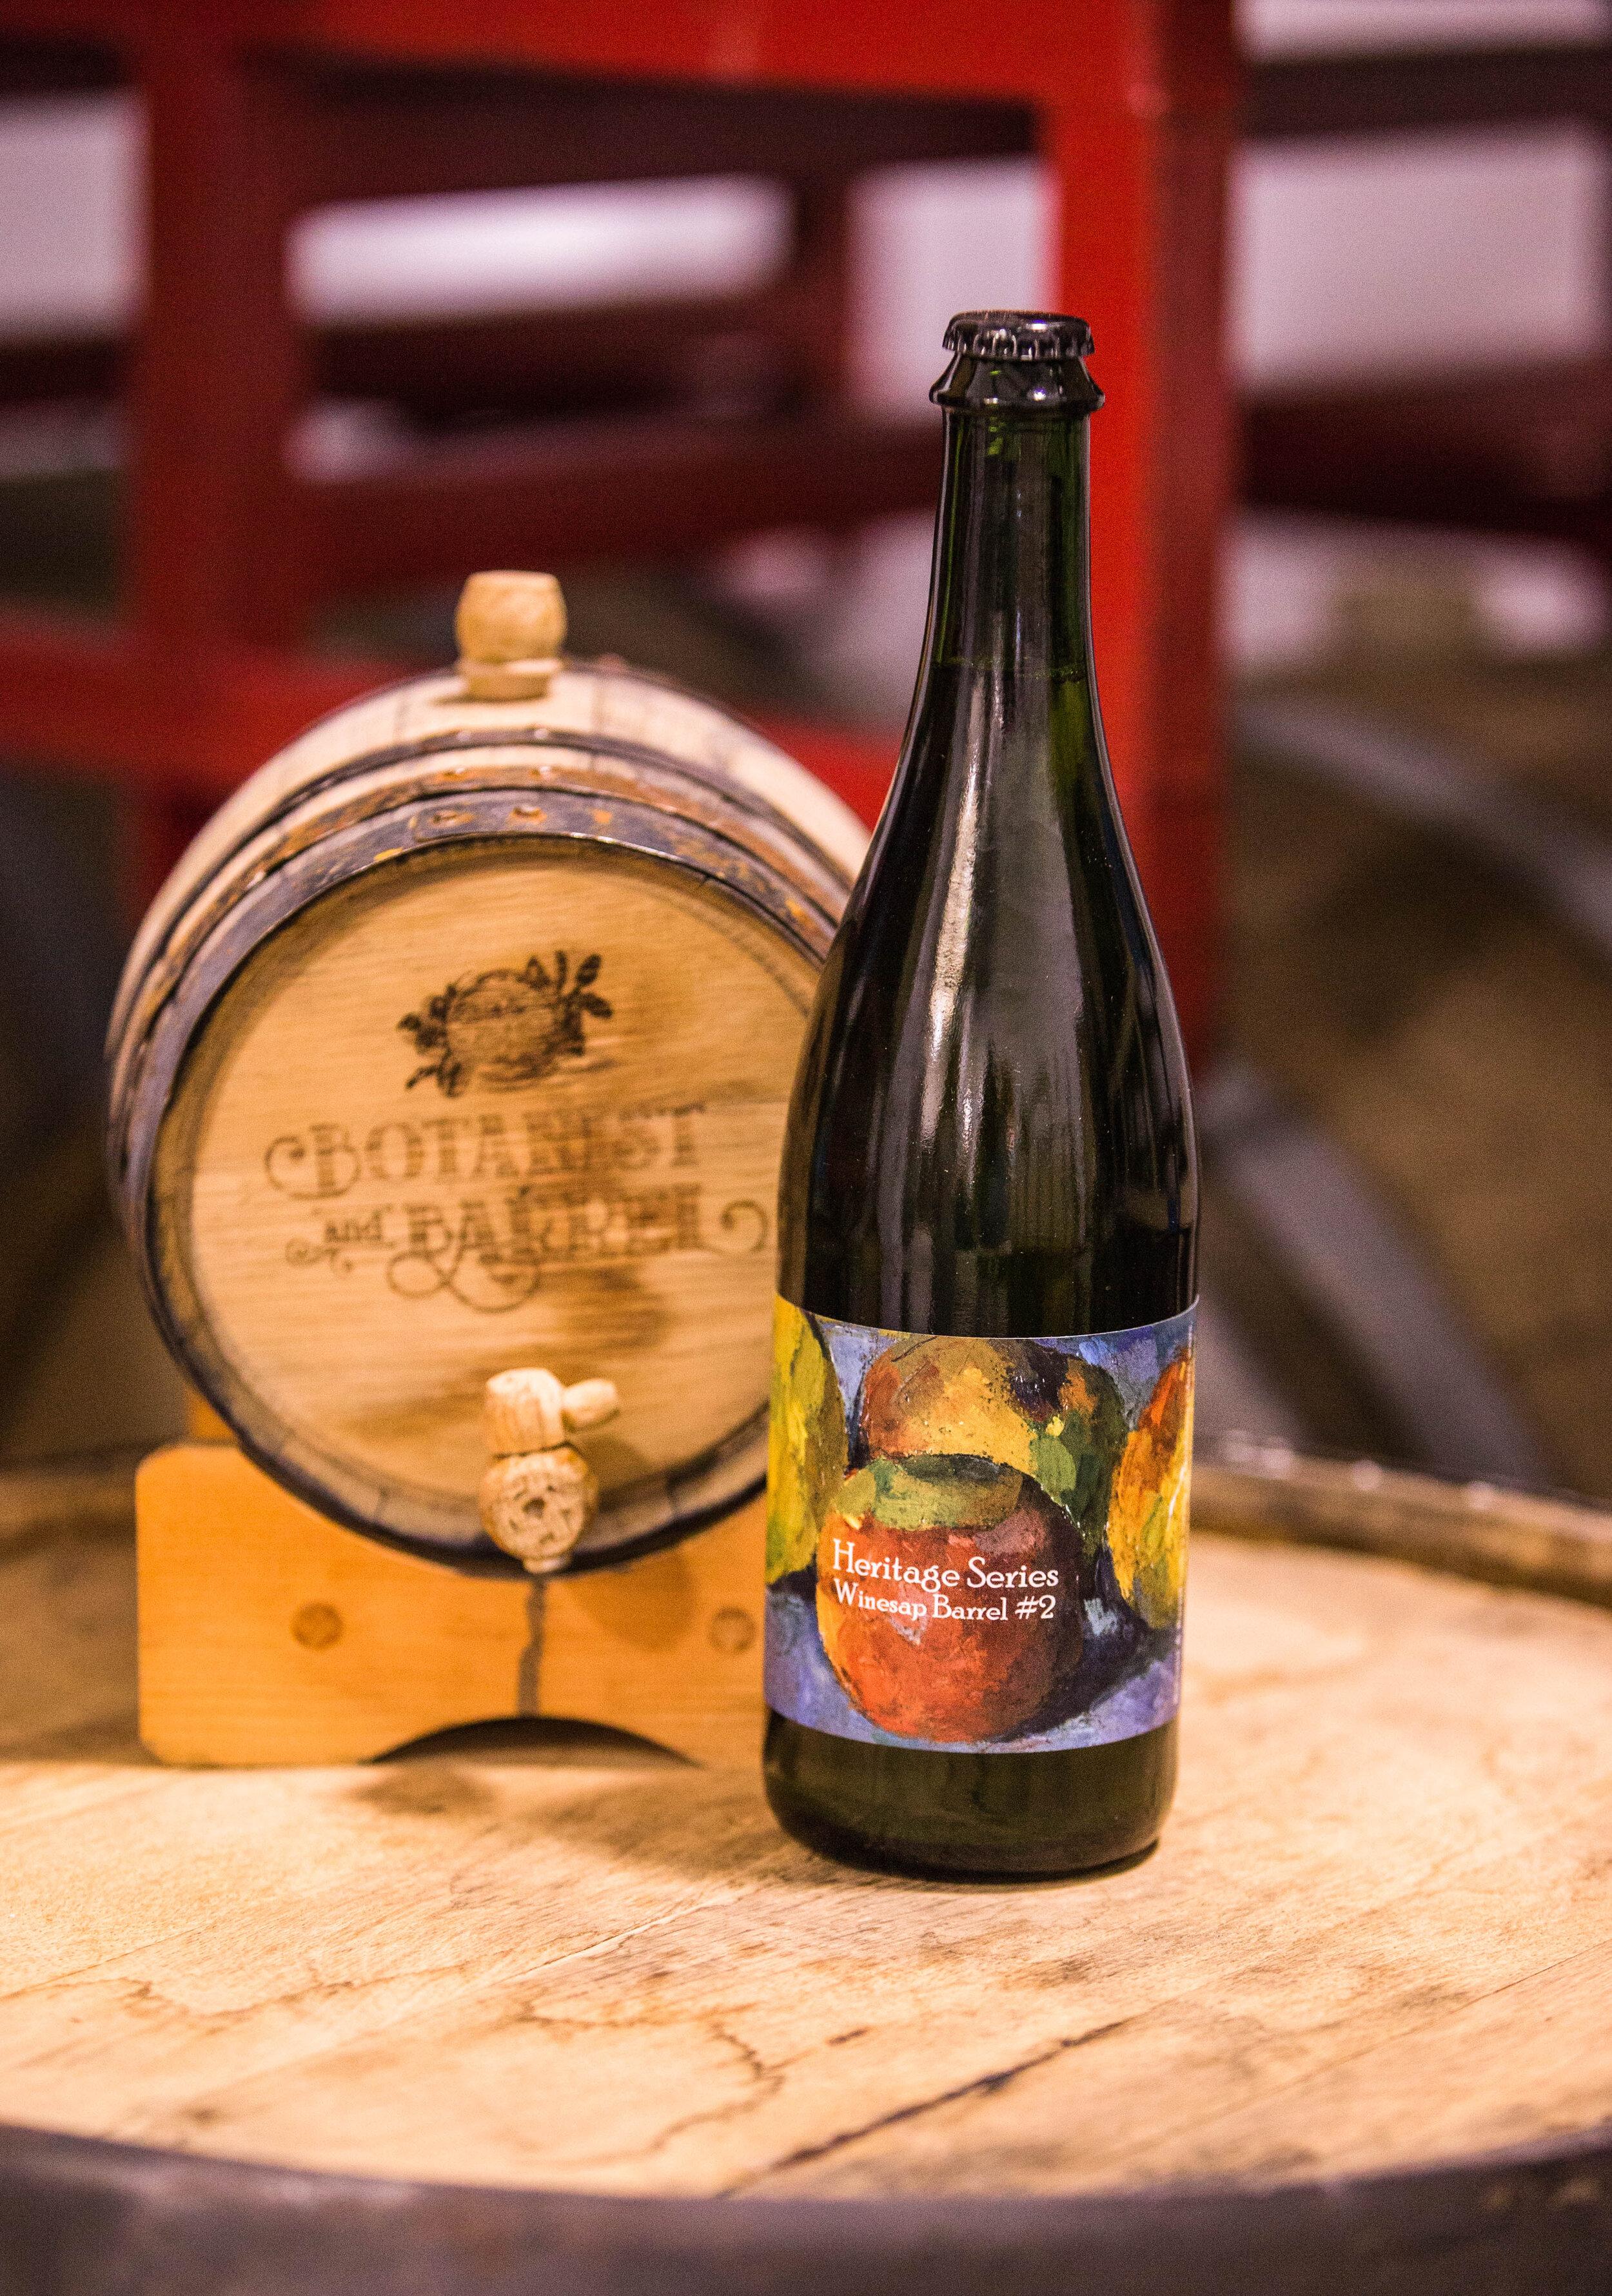 Heritage Series - Single variety ciders. Winesap, Arkansas Black + more to come